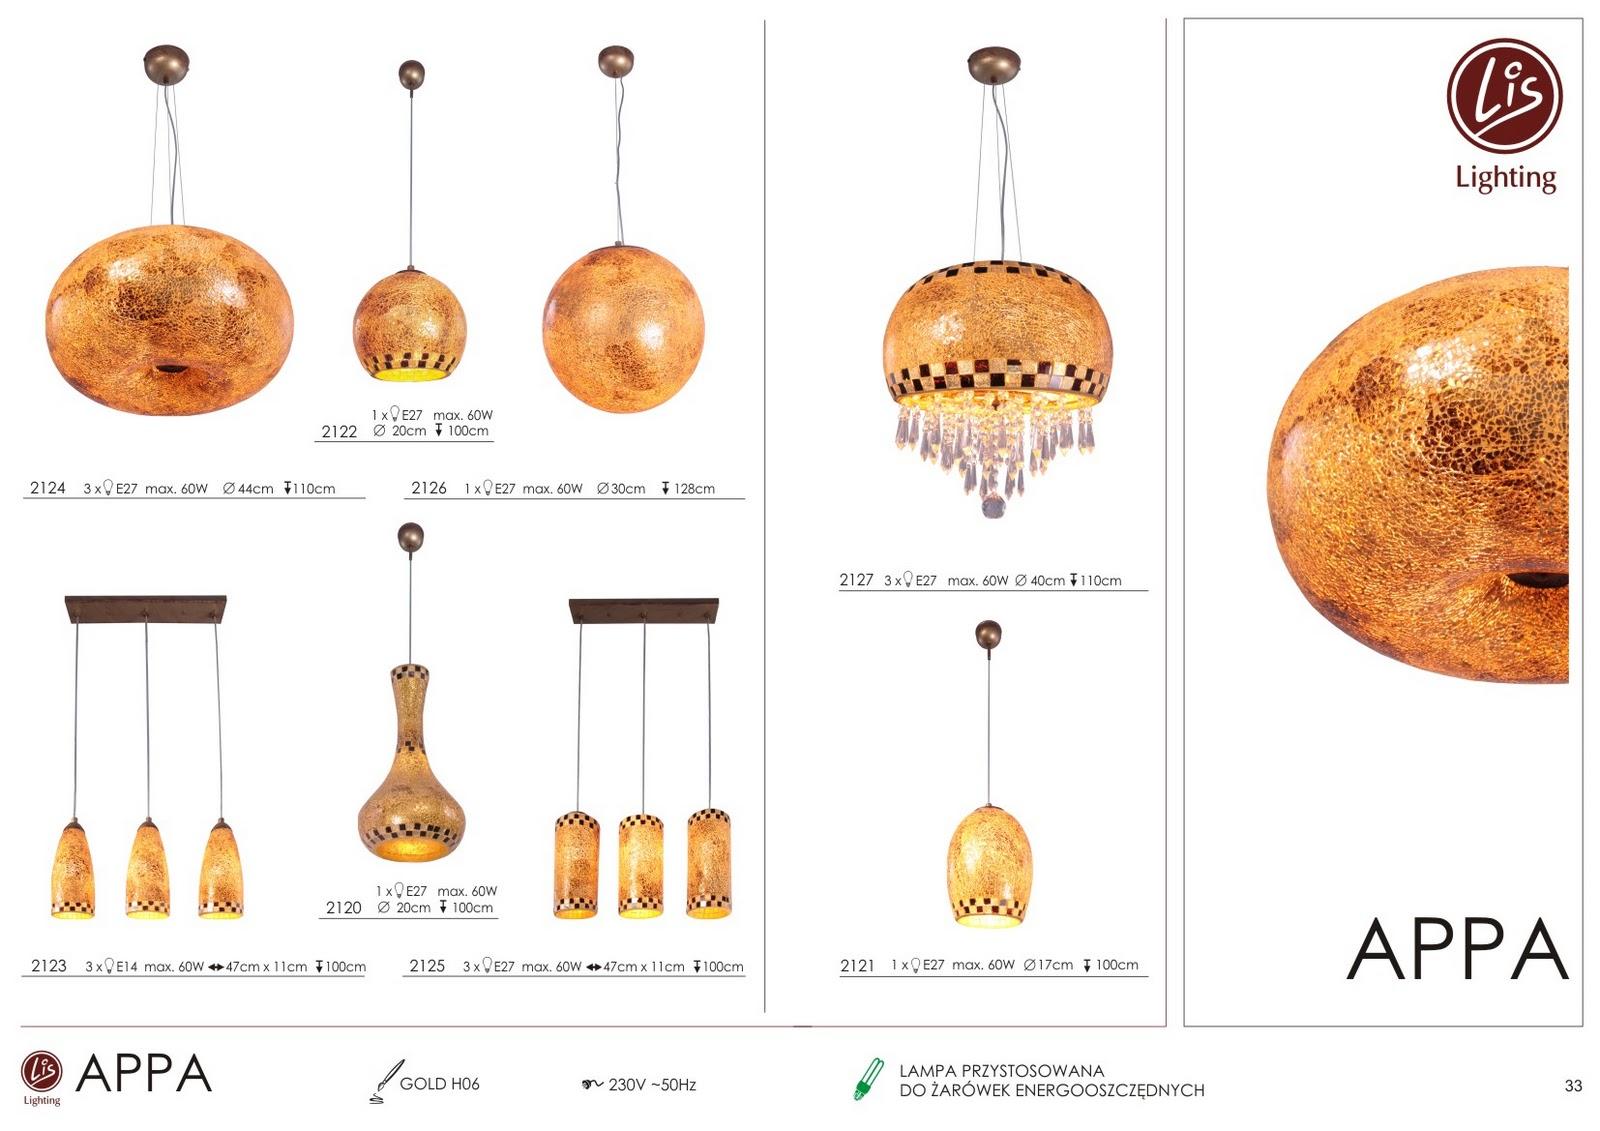 Lis Lighting Aktualności Appa Nowa Kolekcja Lamp